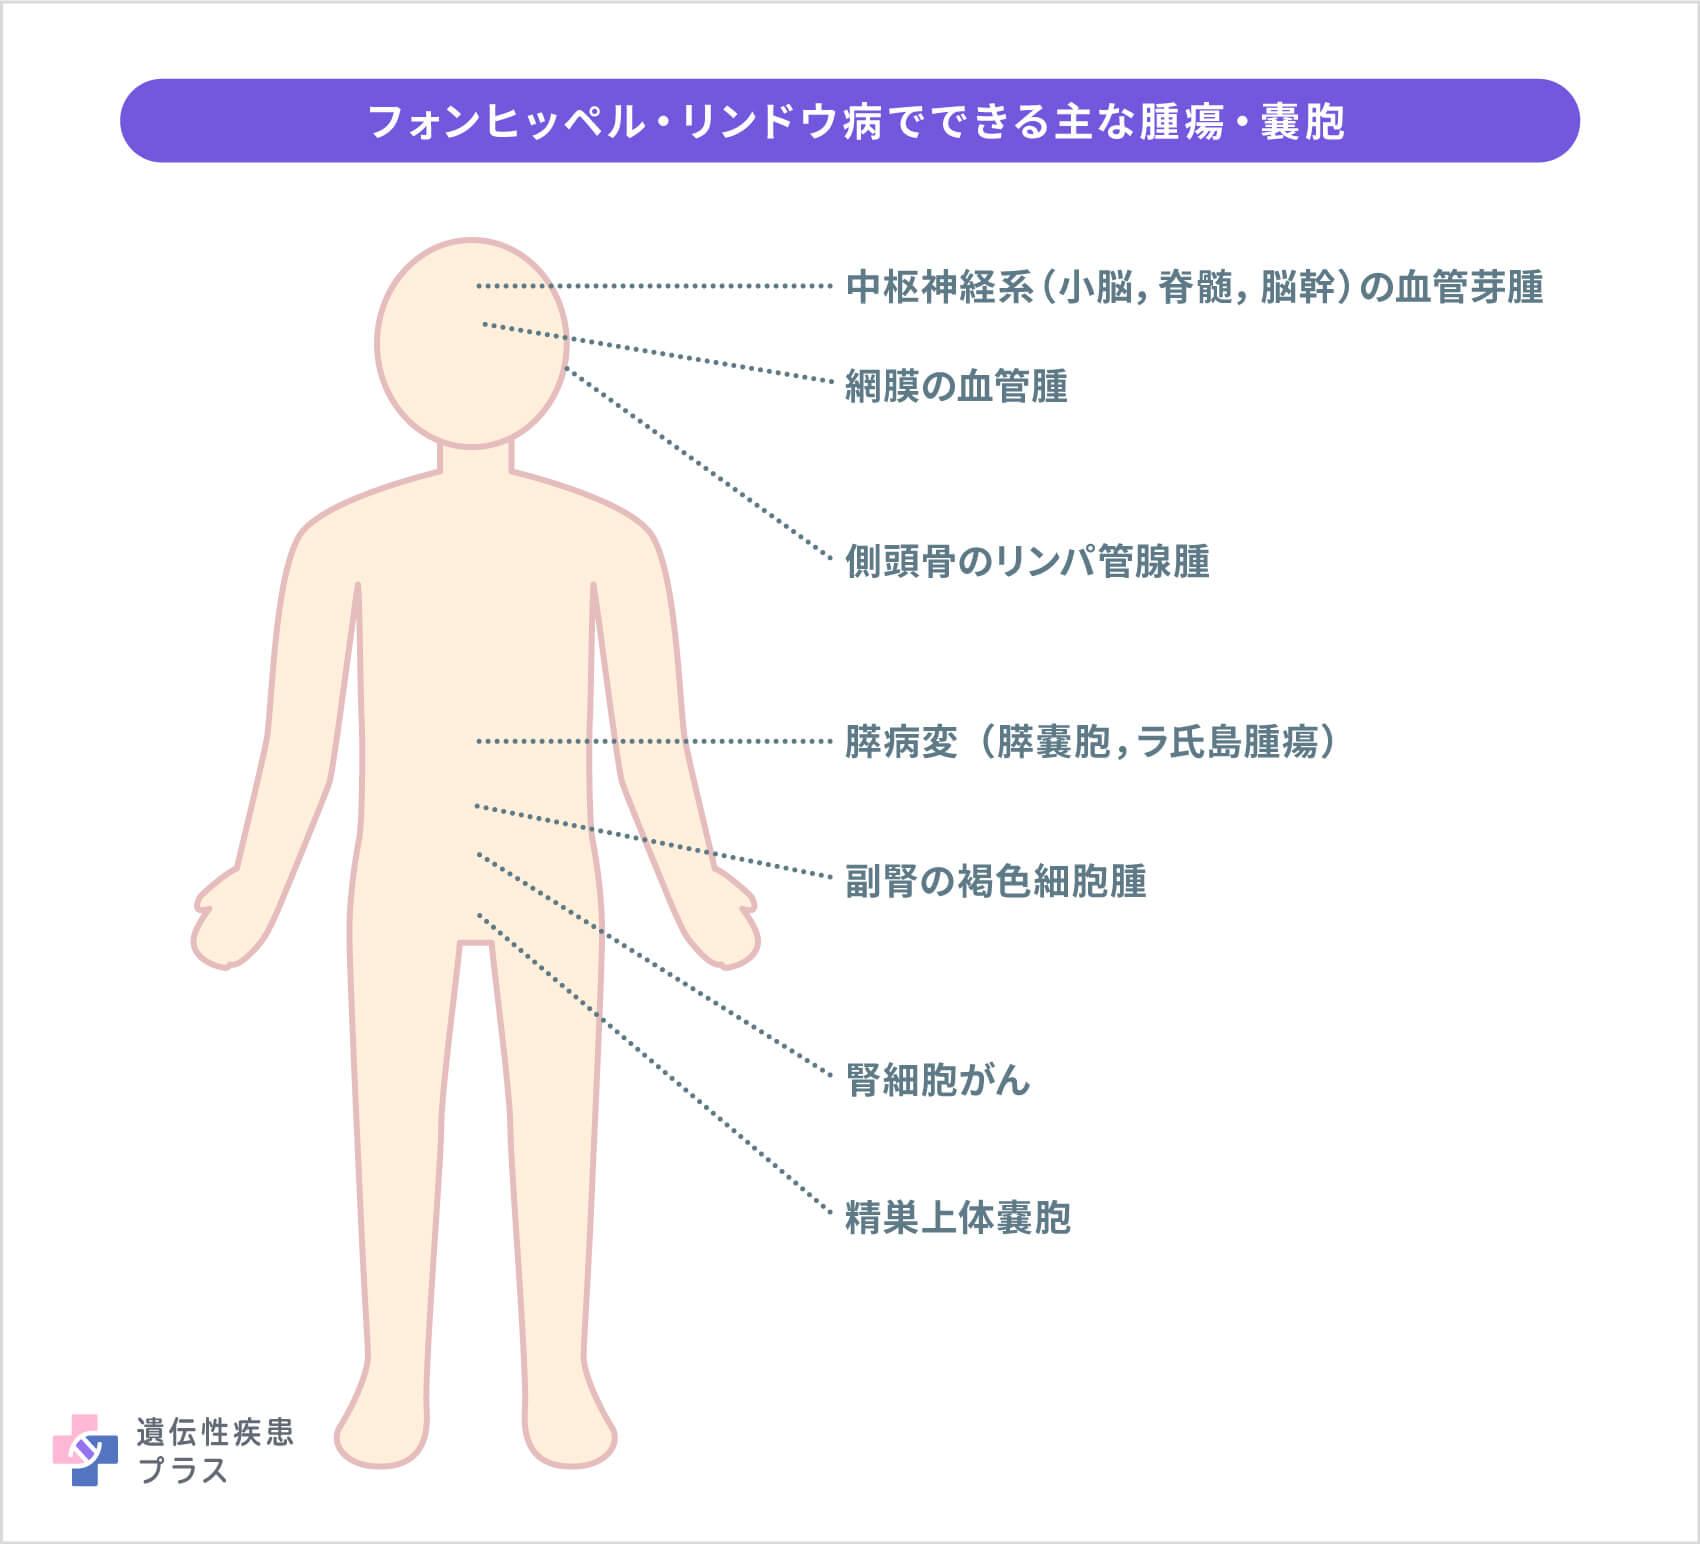 56 Vhl病 主な腫瘍